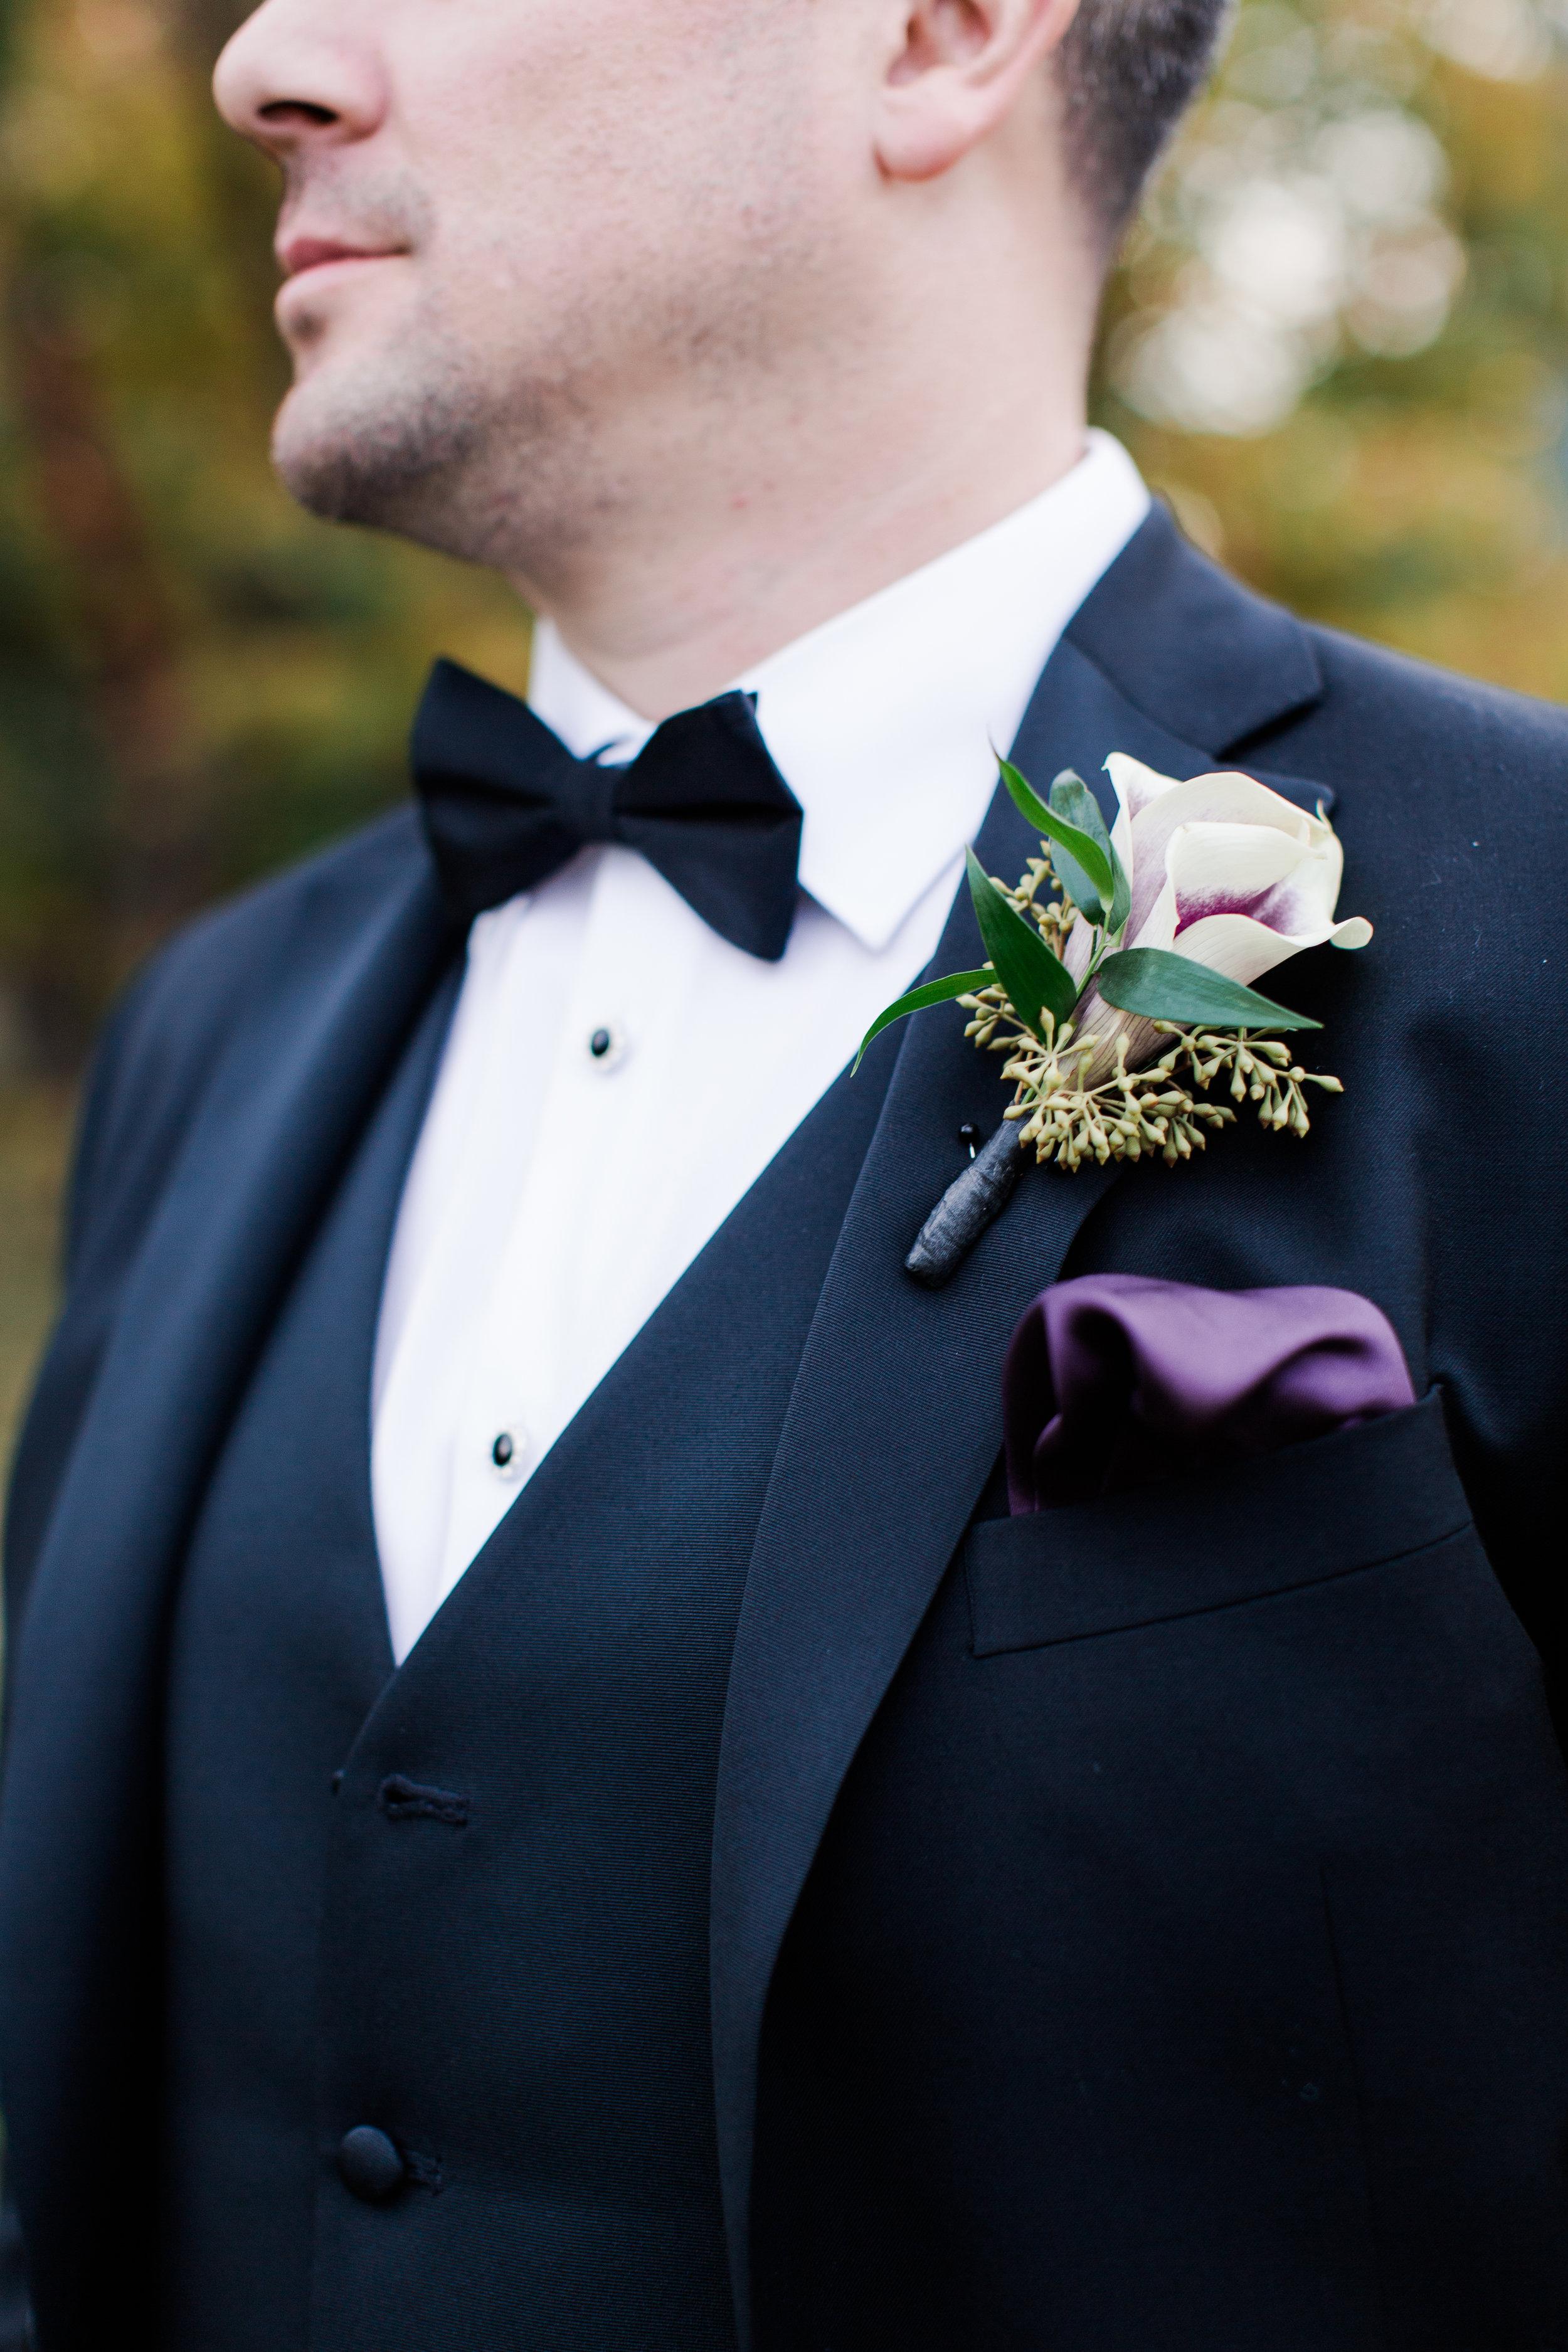 DavidAmandaMundy-Wedding-10282017-KathrynIvyPhotography-356.jpg